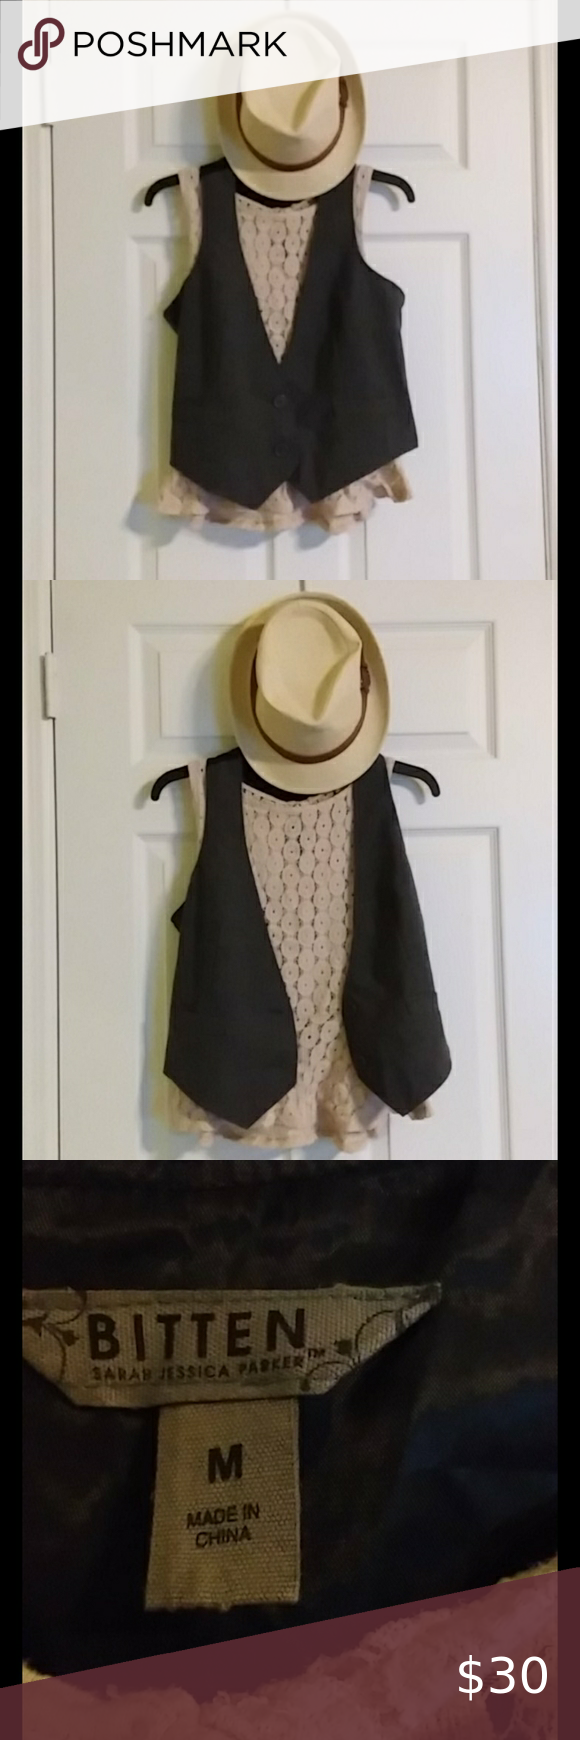 Bitten vest : by Sarah Jessica parker